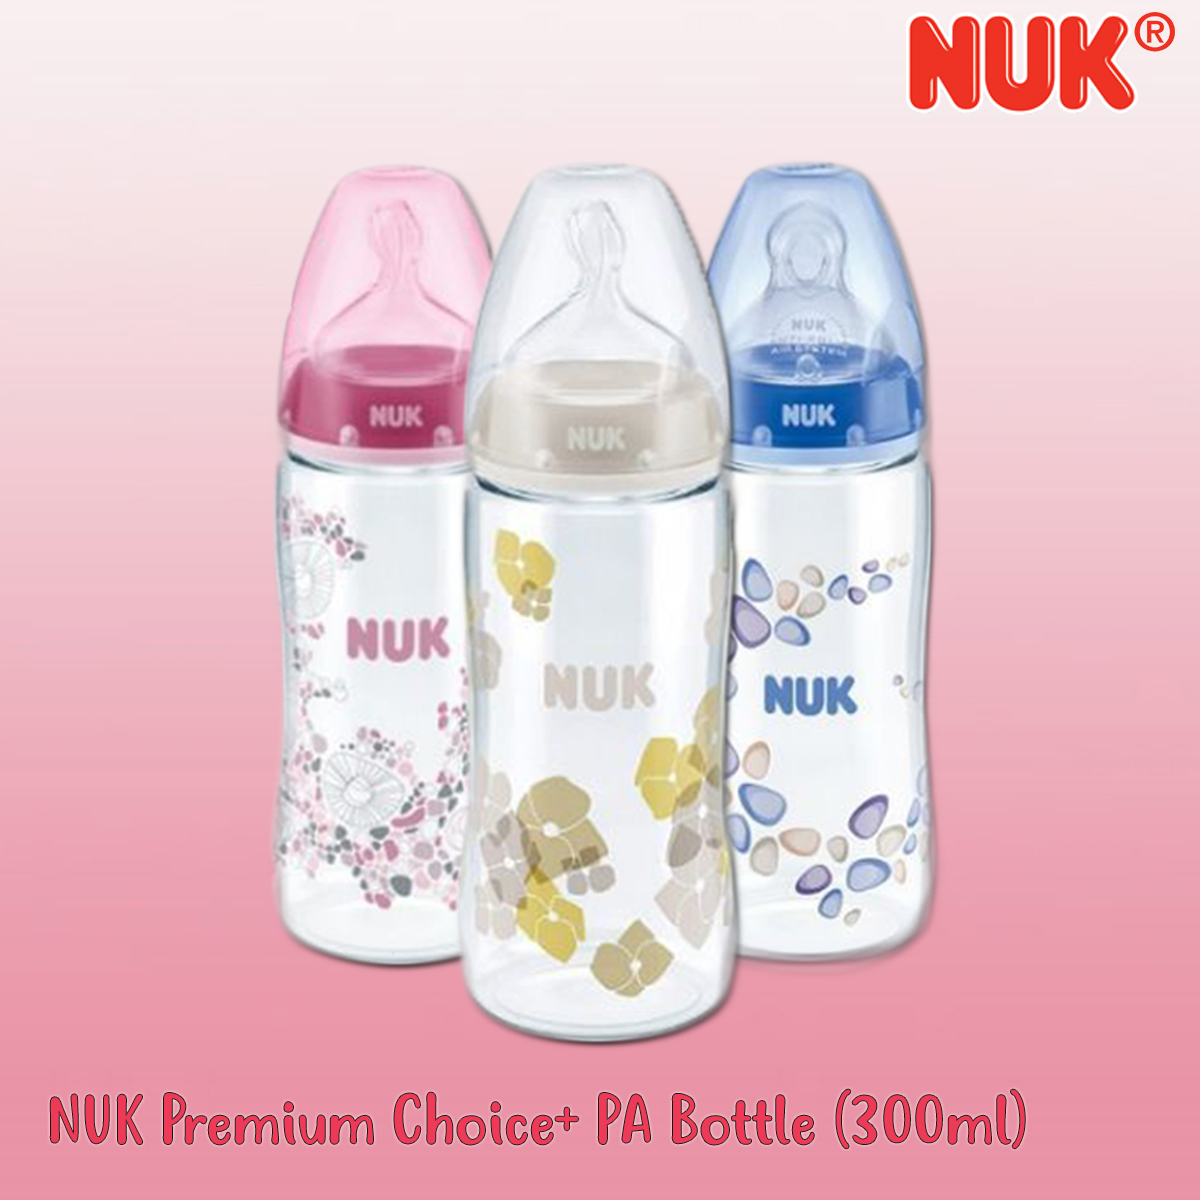 NUK Premium Choice+ PA Bottle (300ml).jpg